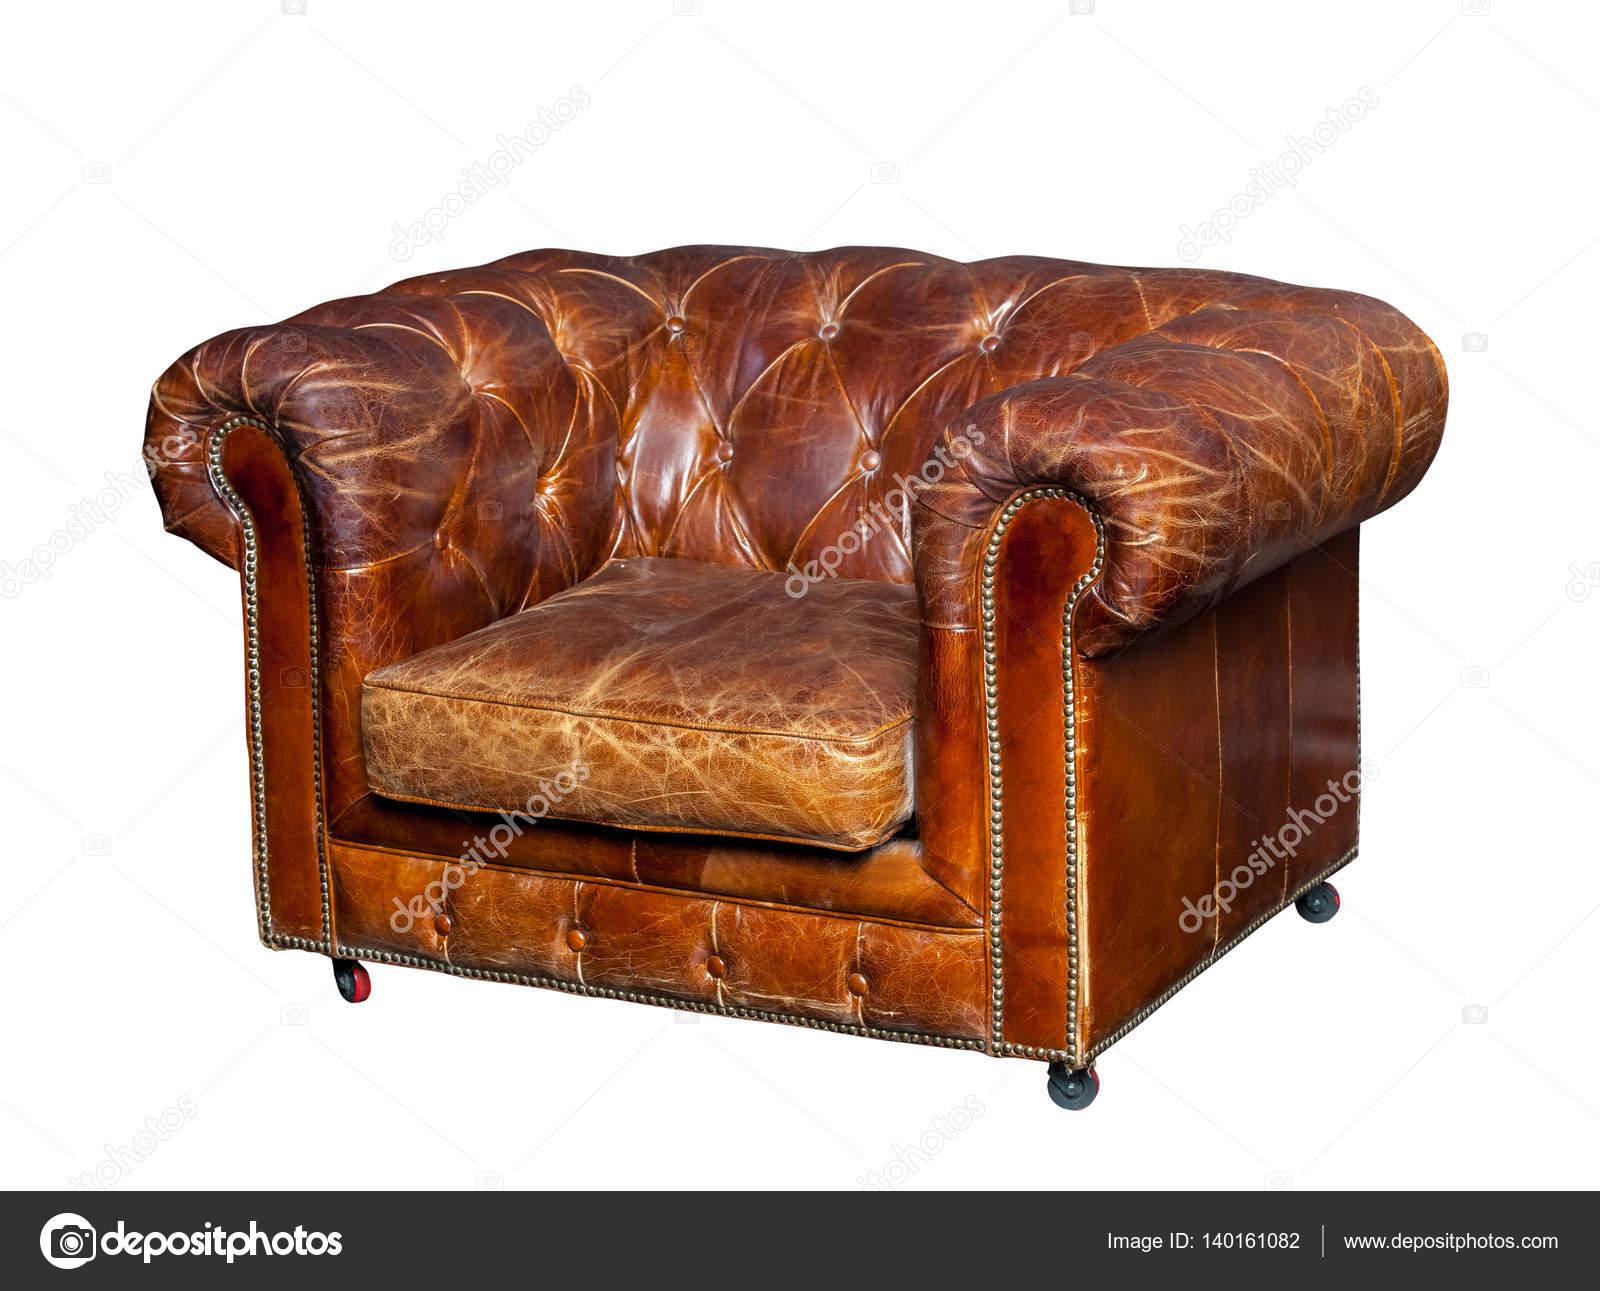 Bruine Leren Stoel : Klassieke bruin lederen stoel u2014 stockfoto © prescott10 #140161082